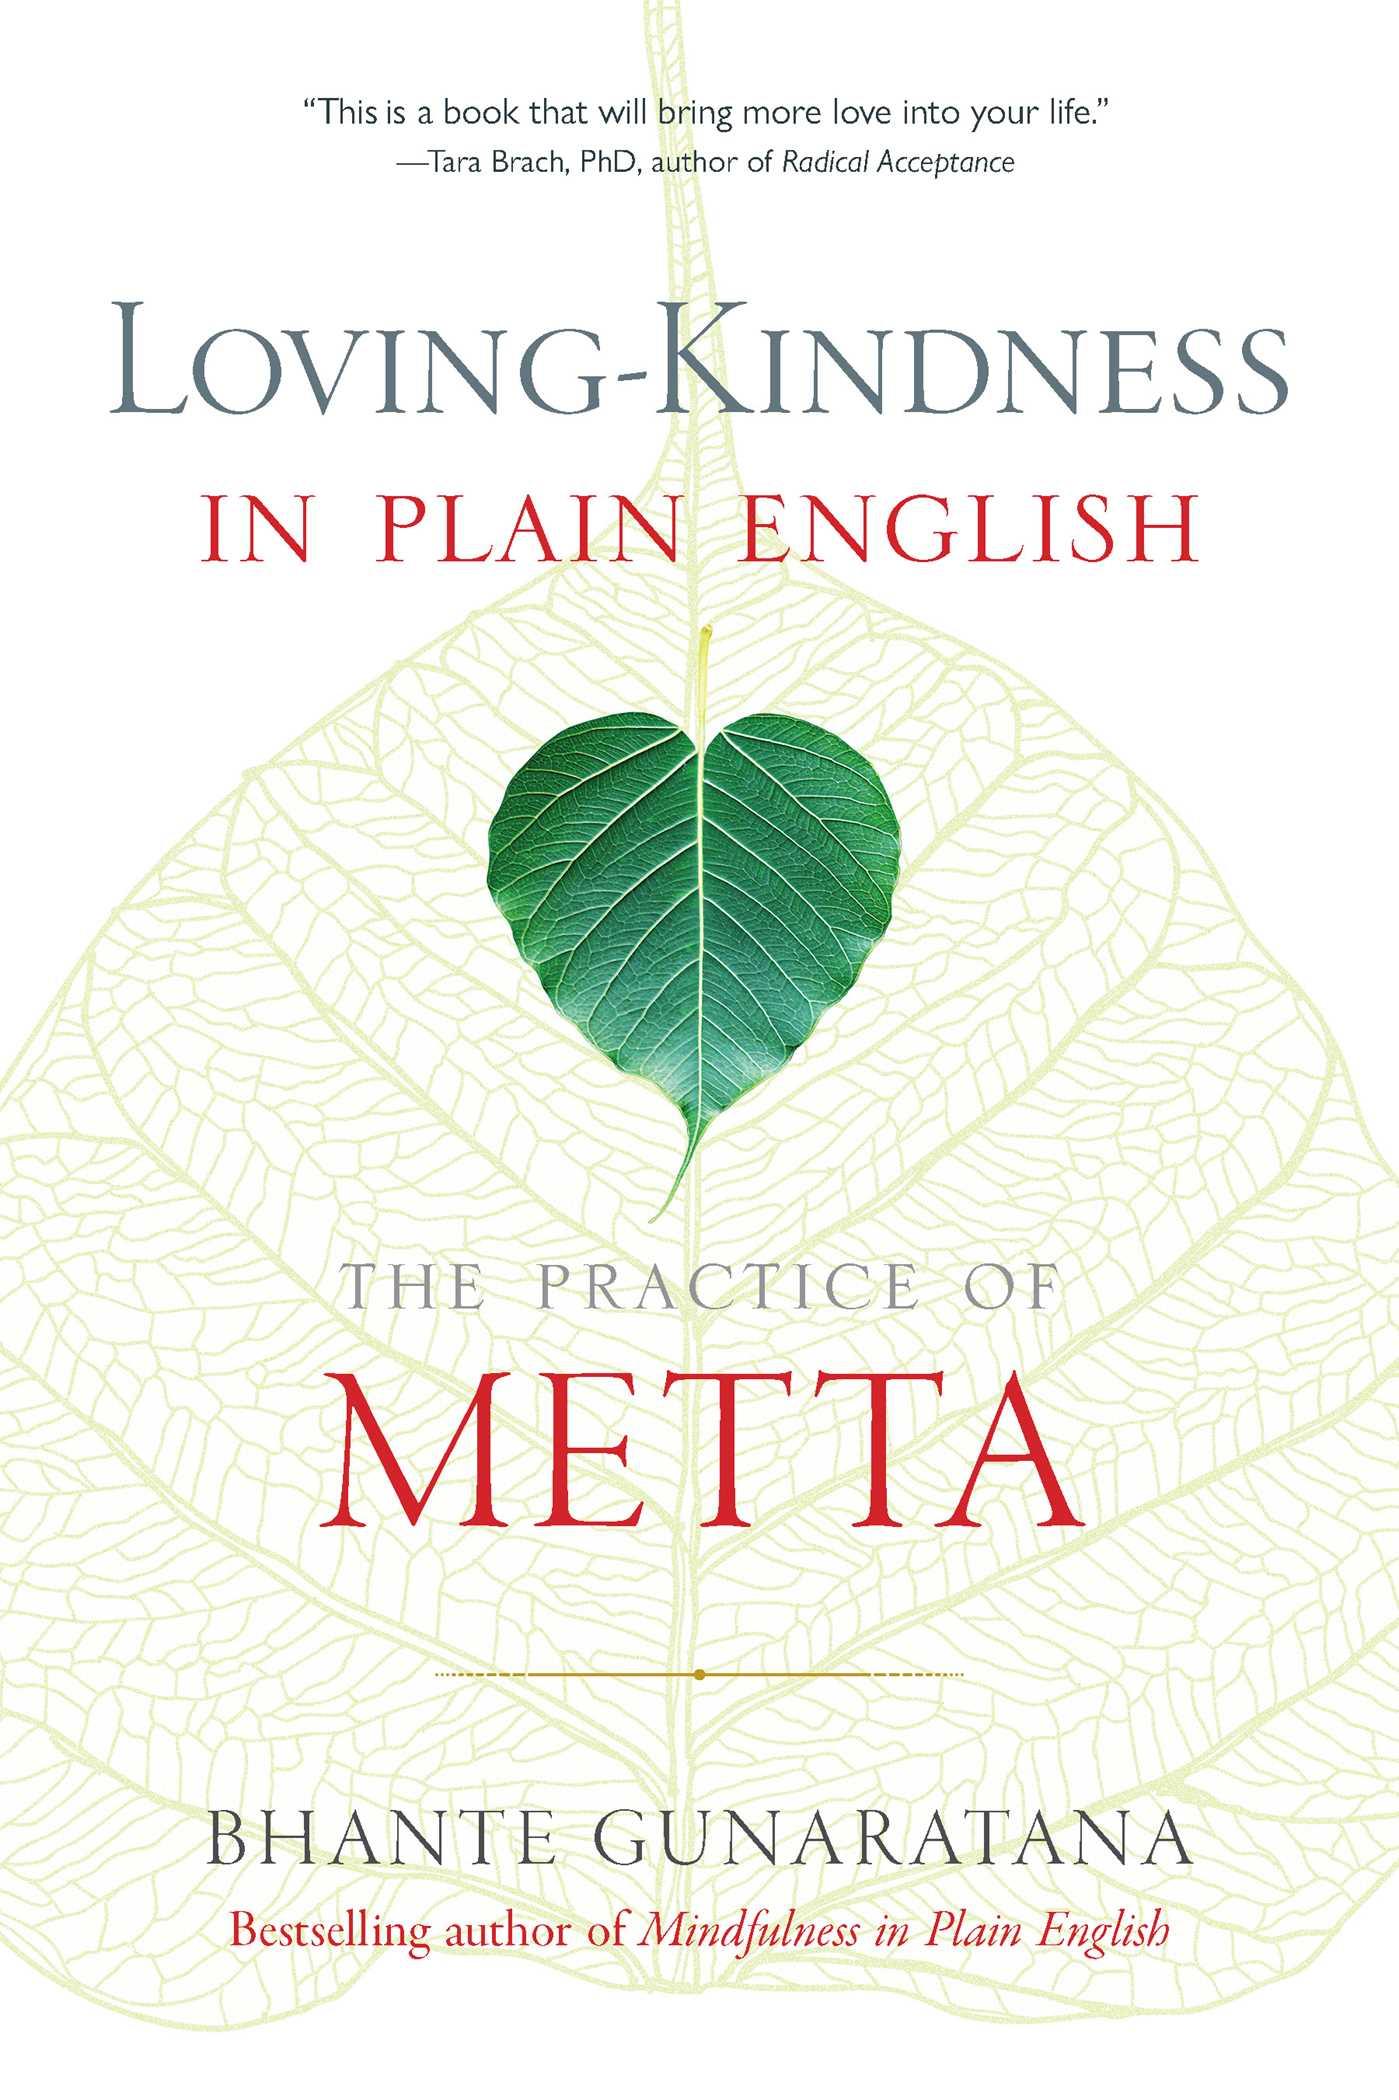 Loving kindness in plain english 9781614292494 hr